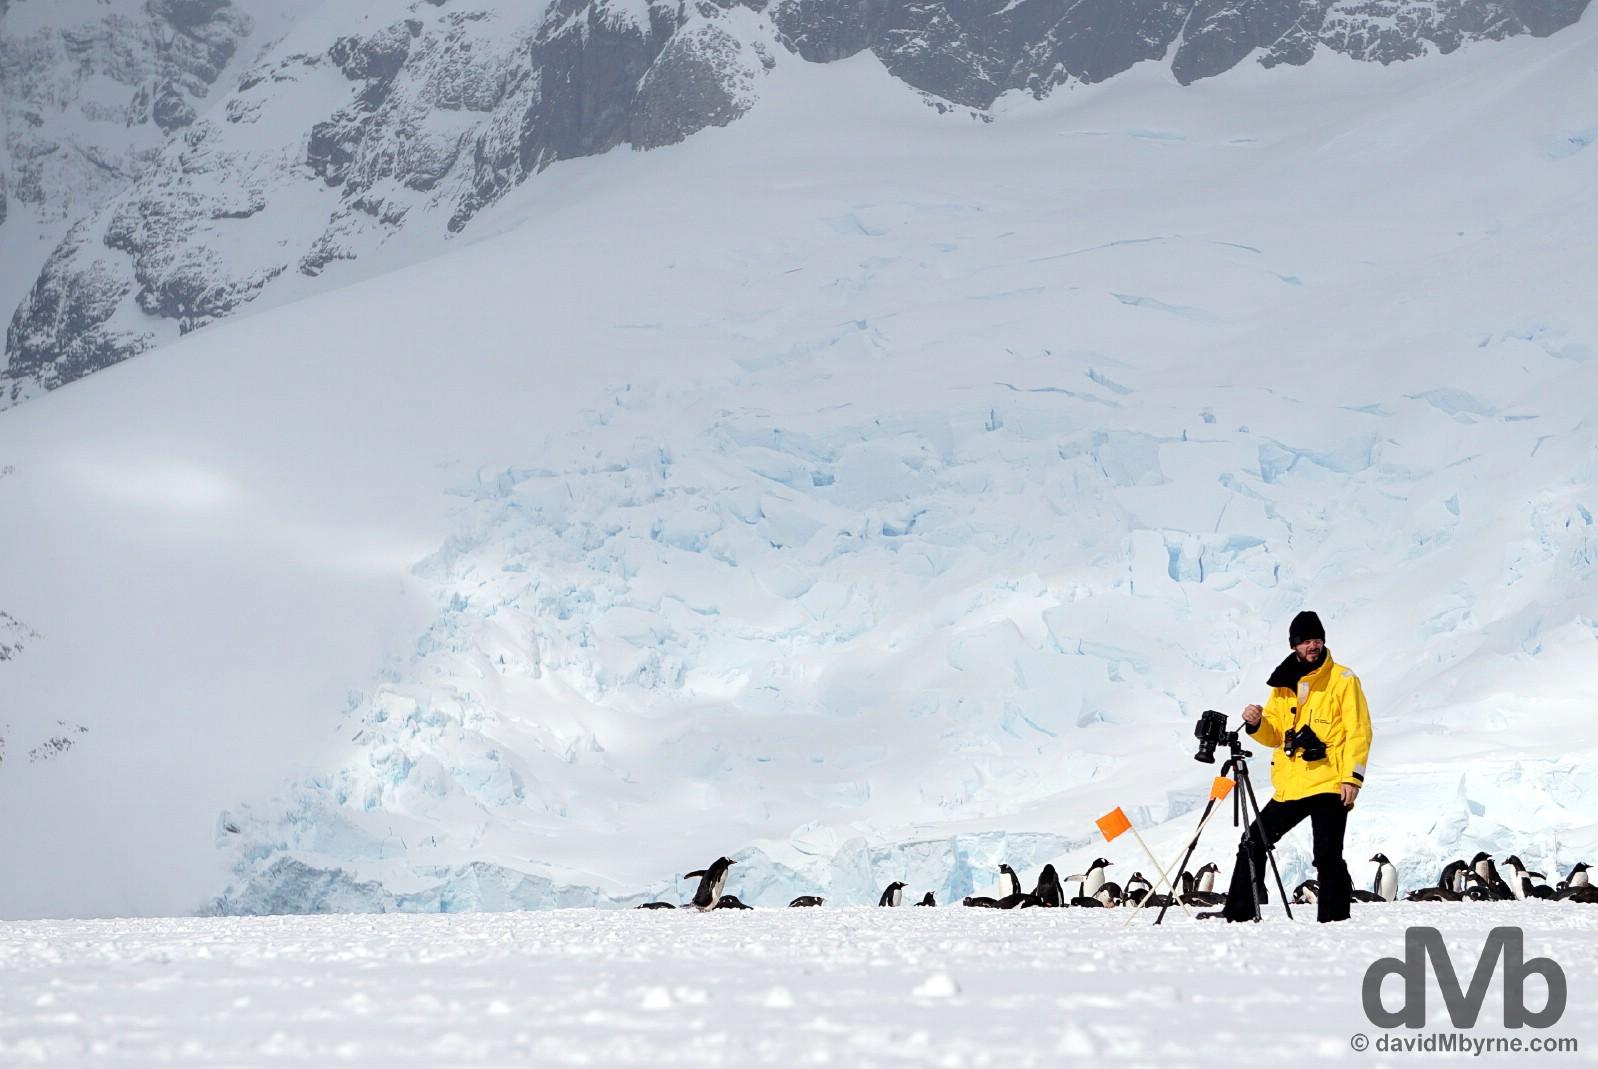 Cuverville Island, Antarctic Peninsula. December 1, 2015.